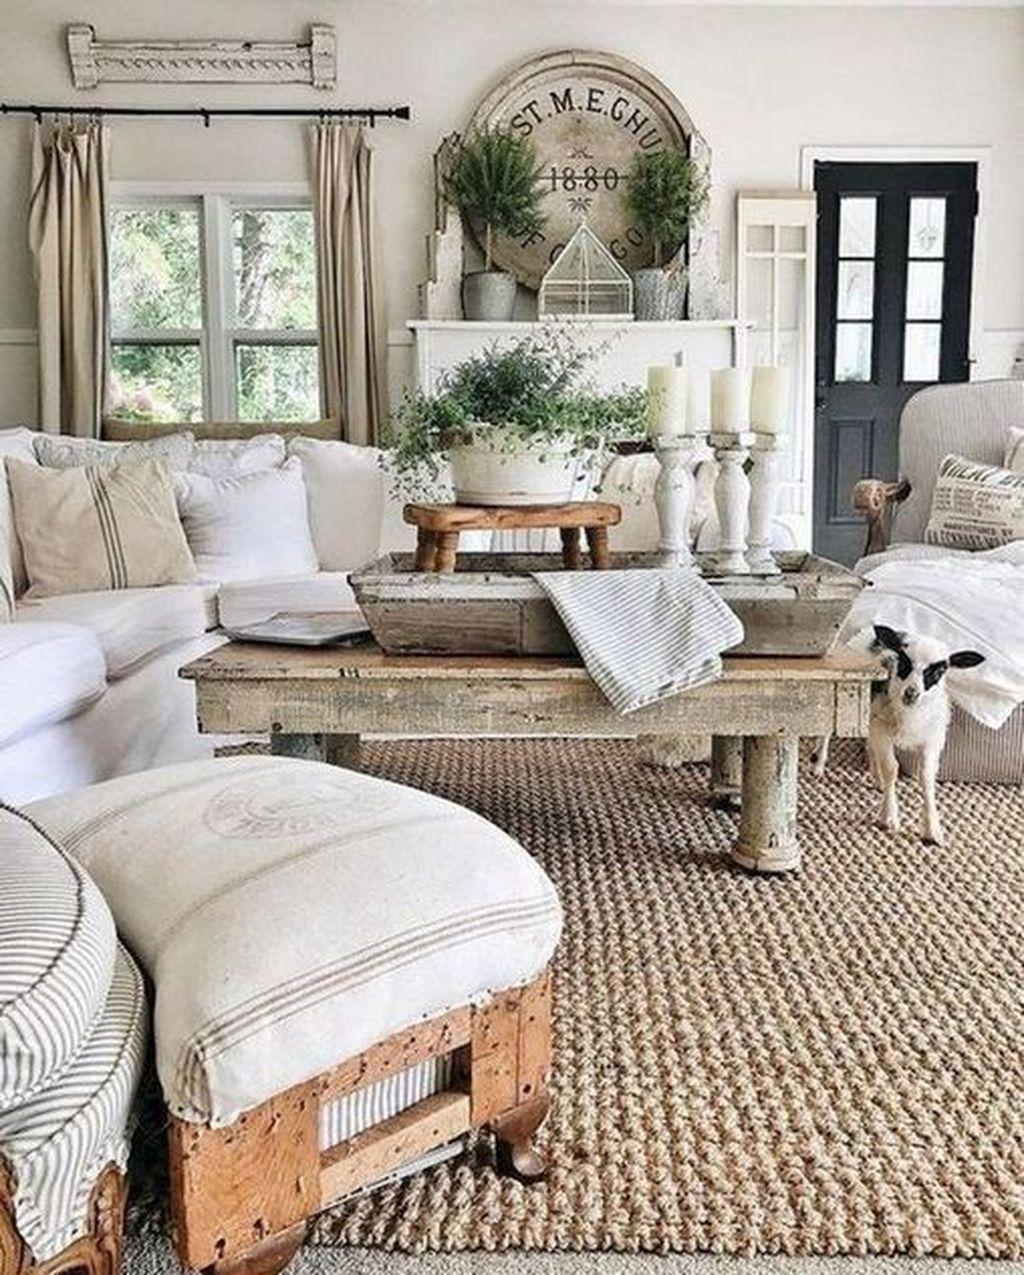 Incredible Rustic Farmhouse Living Room Design Ideas 30